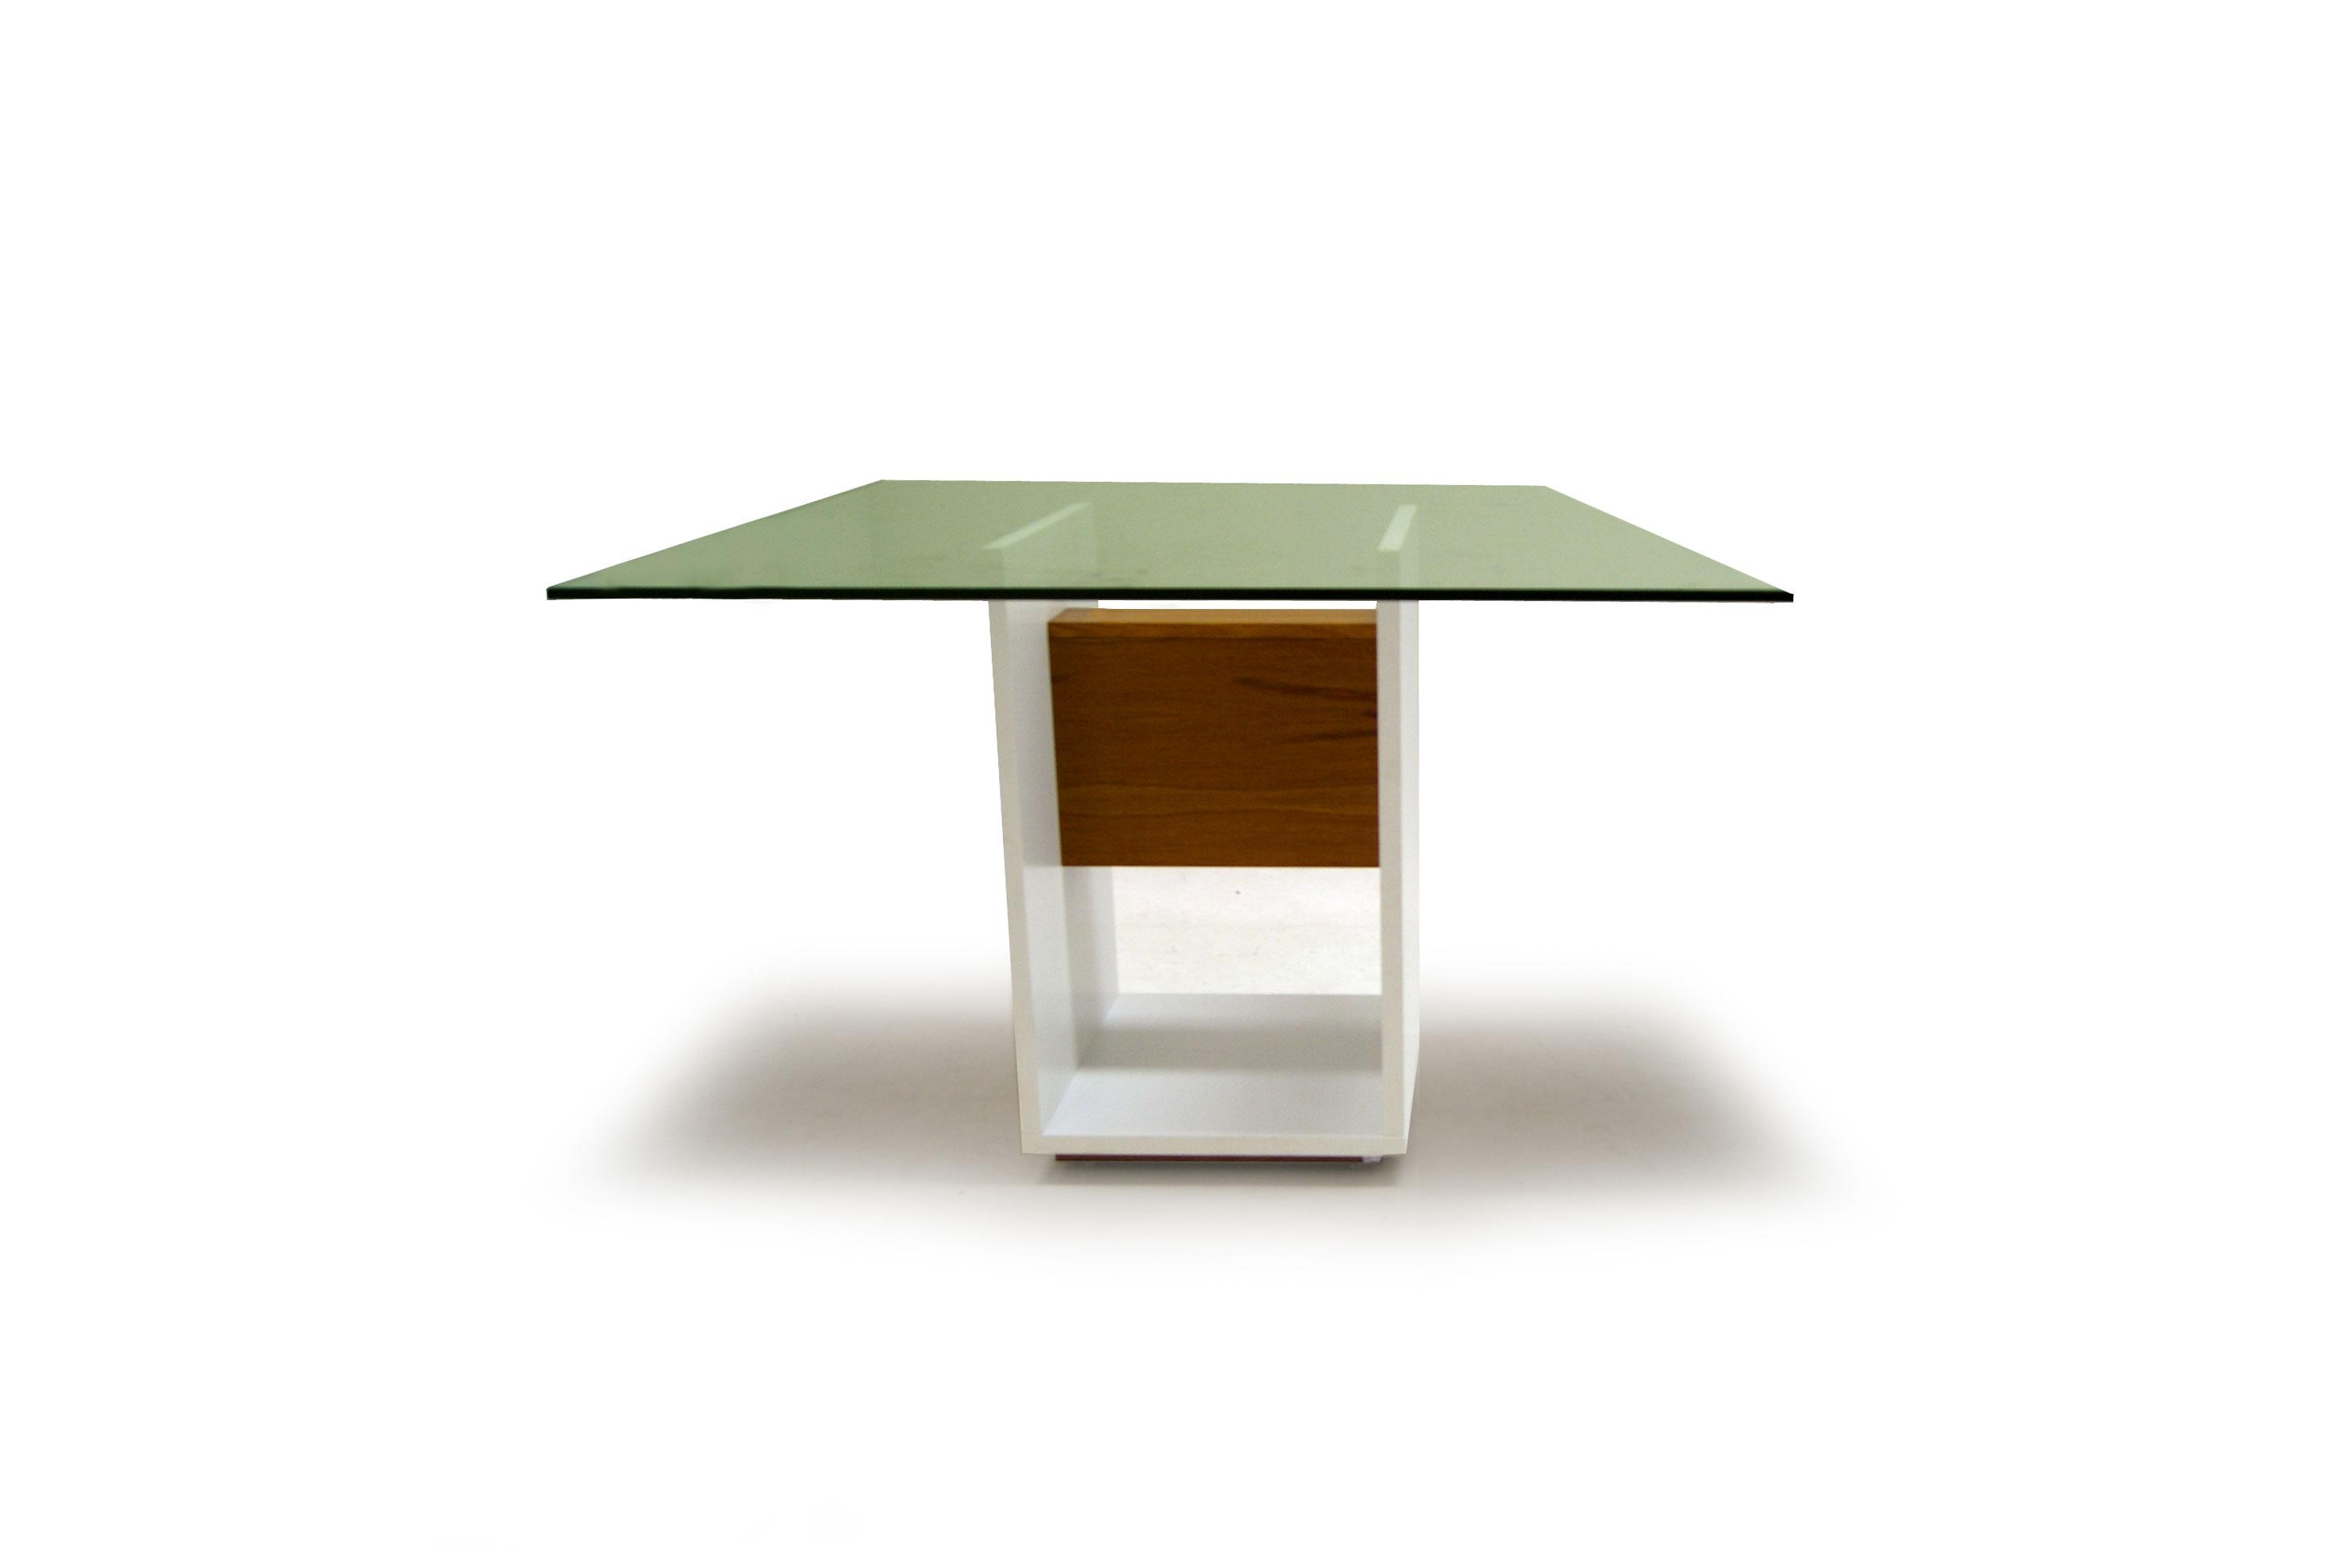 Mesa de Jantar 4 Lugares com Vidro, Branca, Nord